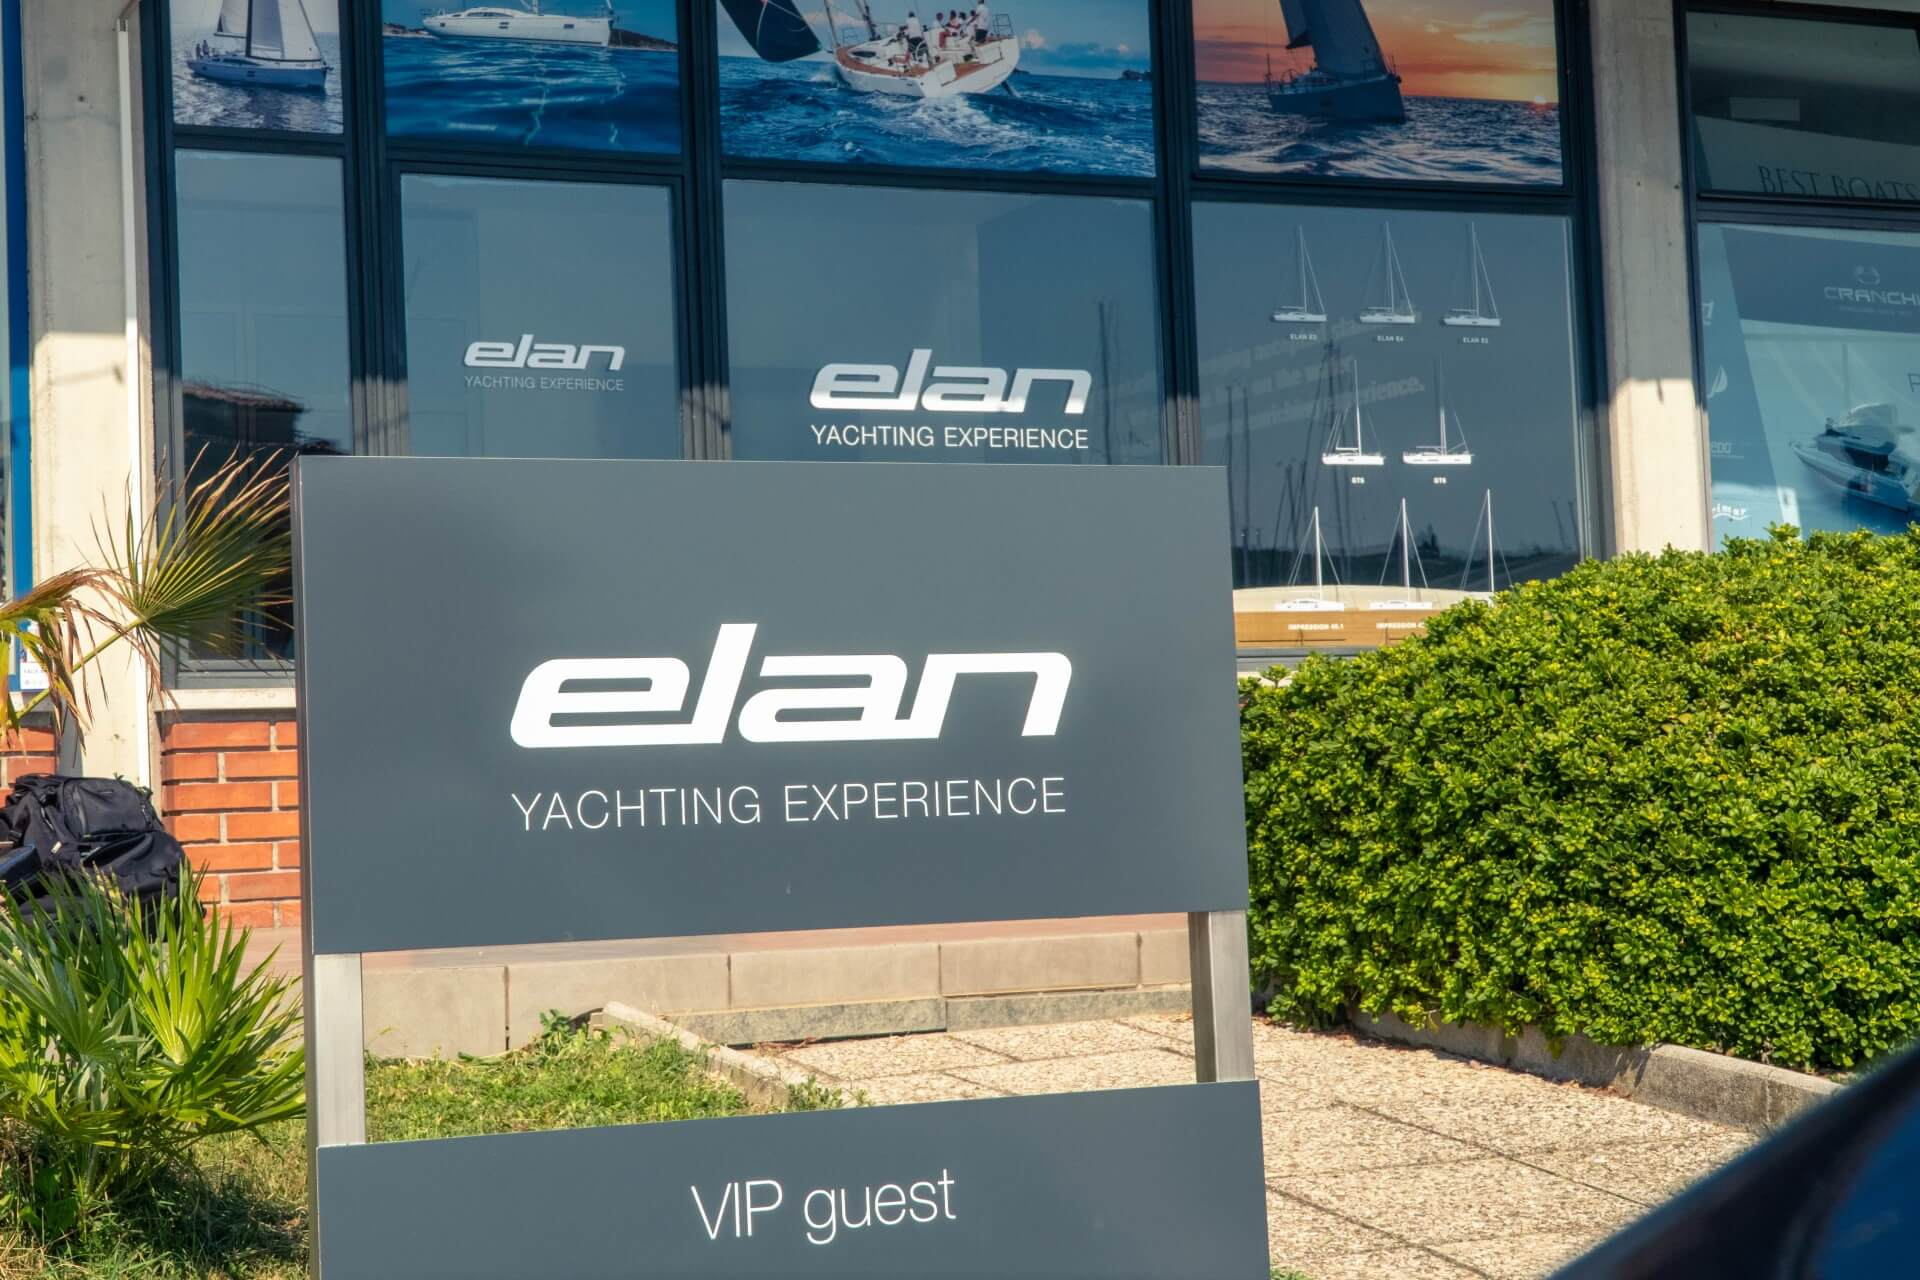 Elan Yachting Experience